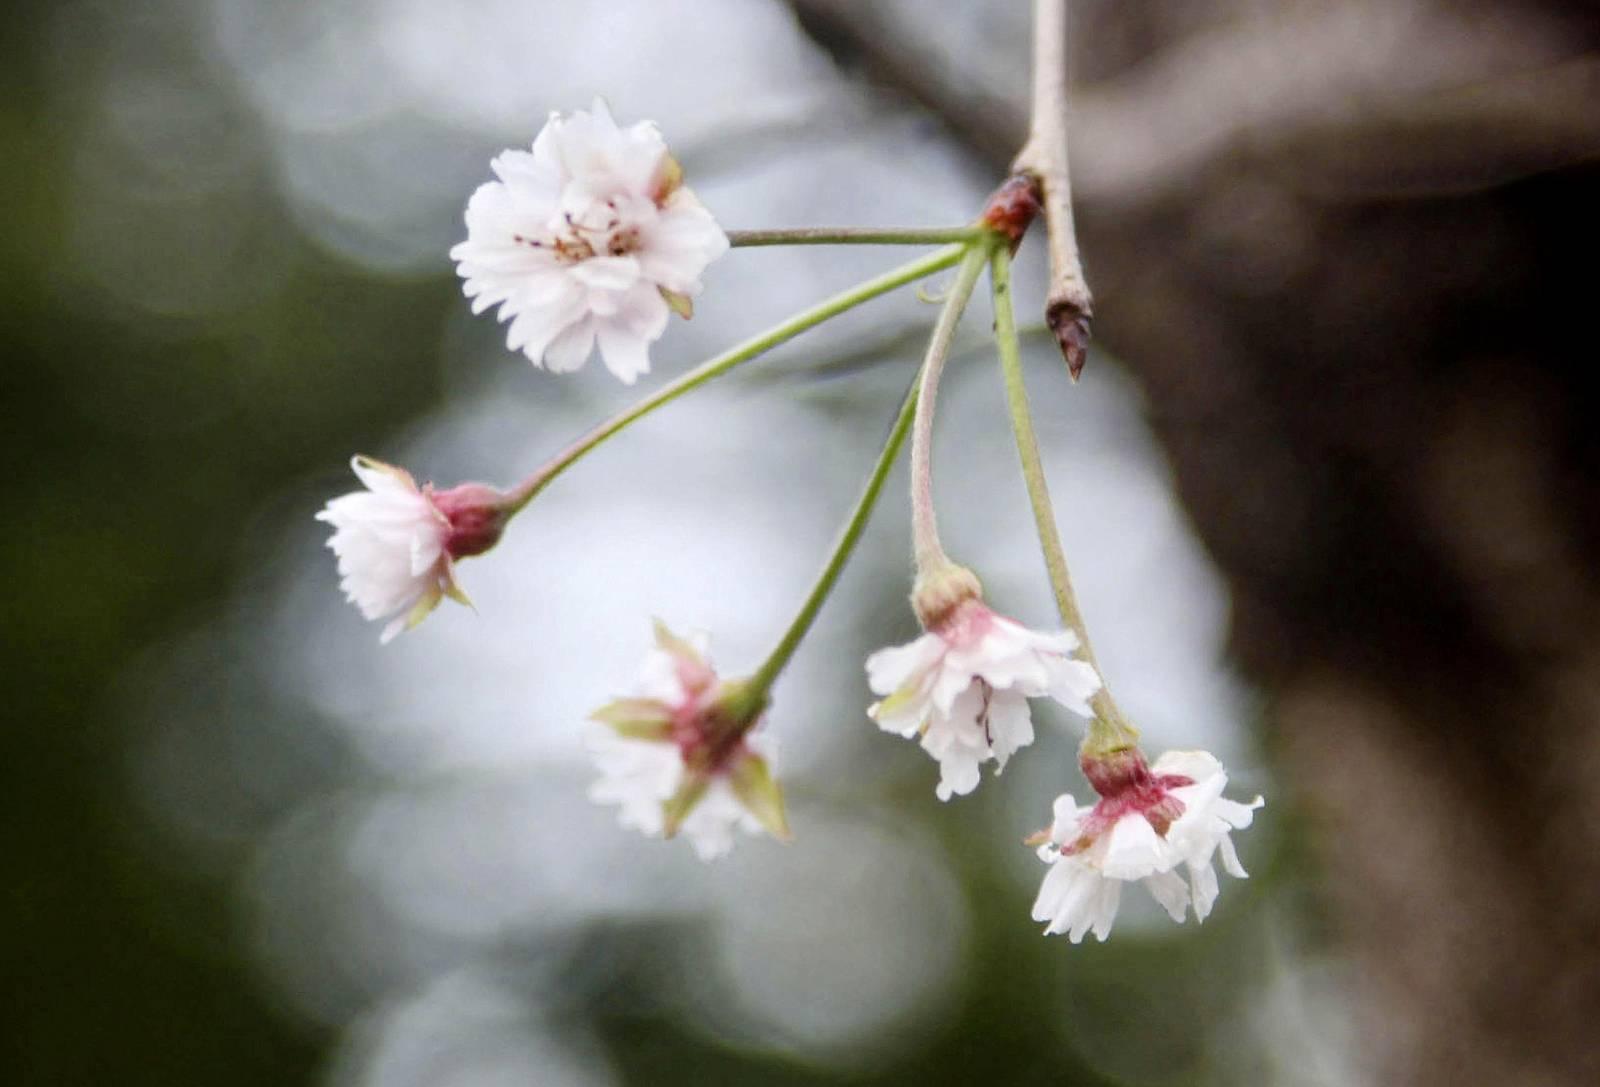 Taifune bringen Japans Kirschbäume zum Blühen